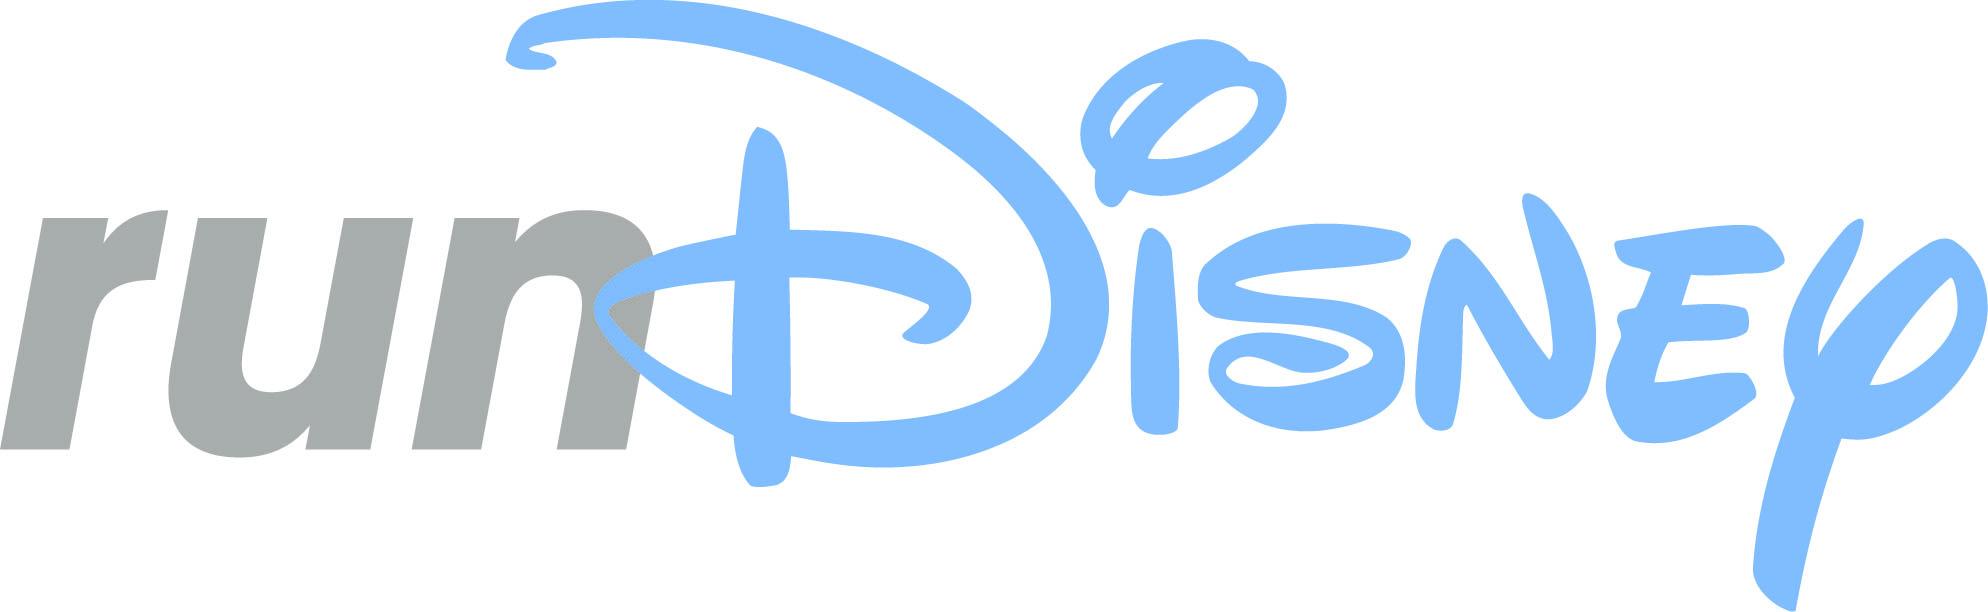 ChEAR Squad Logo